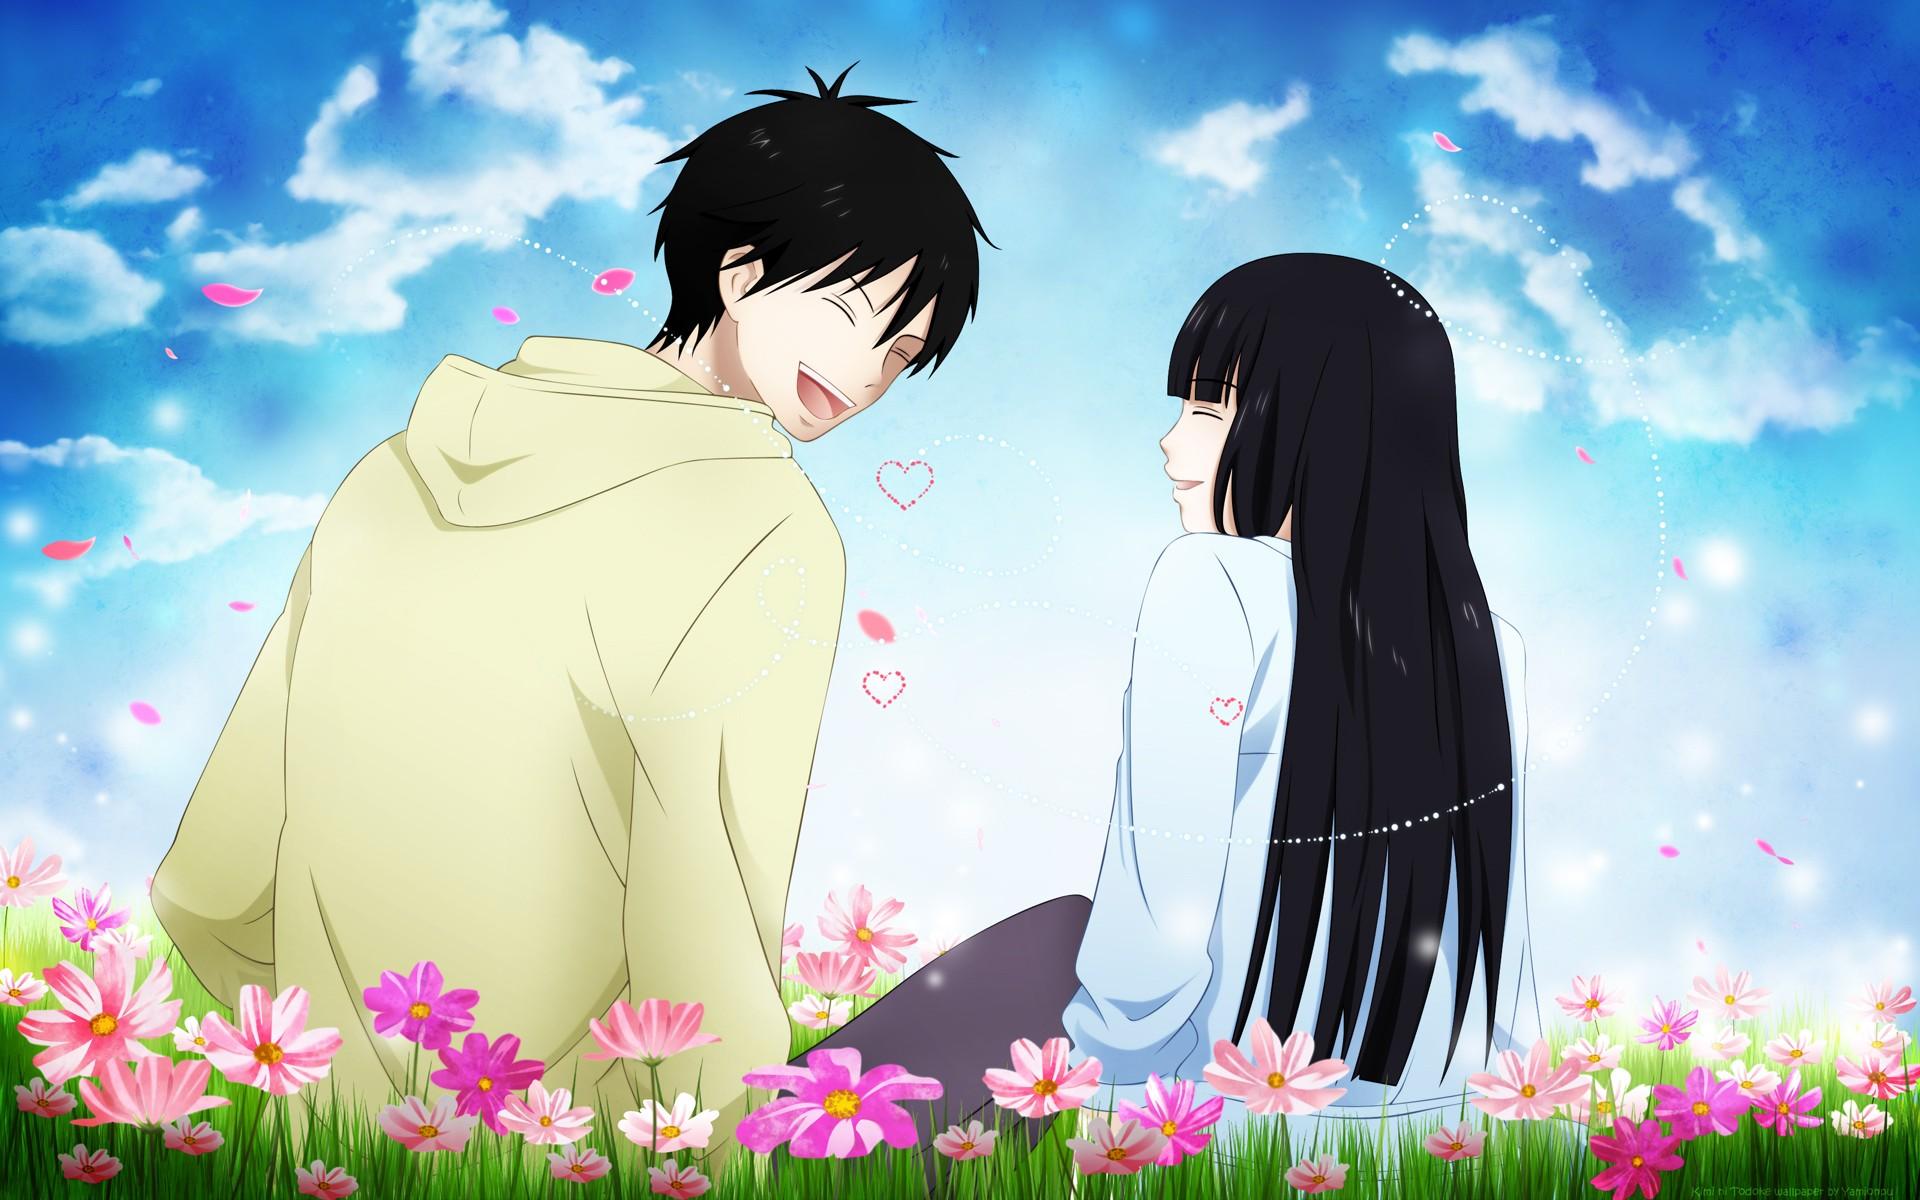 illustration flowers anime anime girls anime boys love emotion Kimi ni Todoke Kuronuma Sawako Kazehaya Shouta romance flower screenshot computer wallpaper interaction 83893